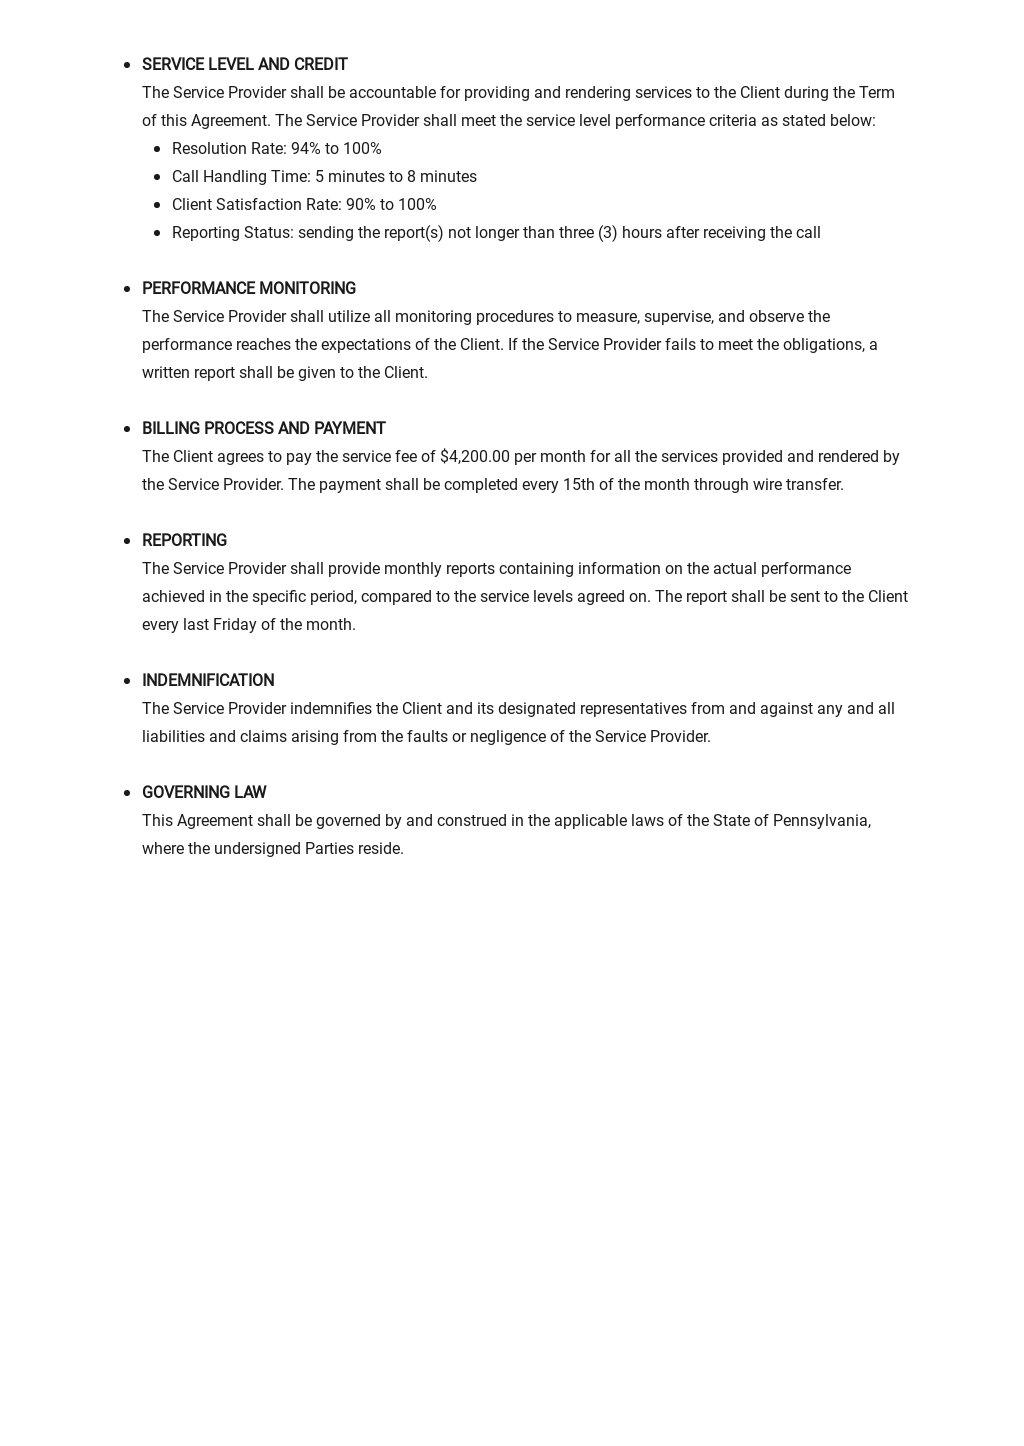 Service Level Agreement Template 2.jpe